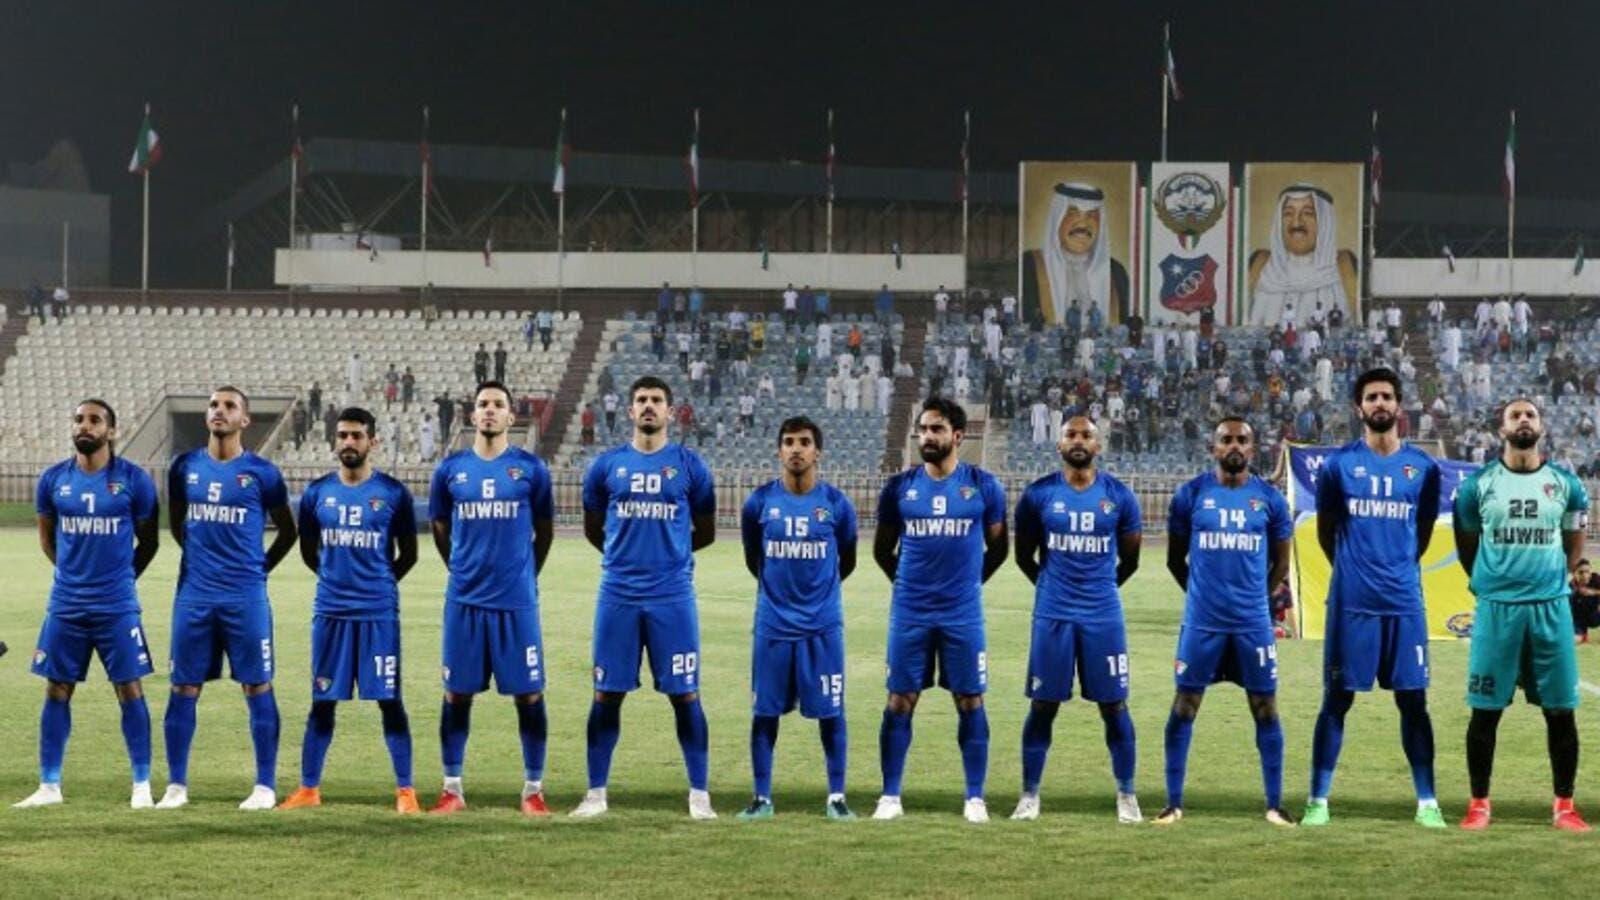 Rose Glen North Dakota ⁓ Try These Kuwait Football